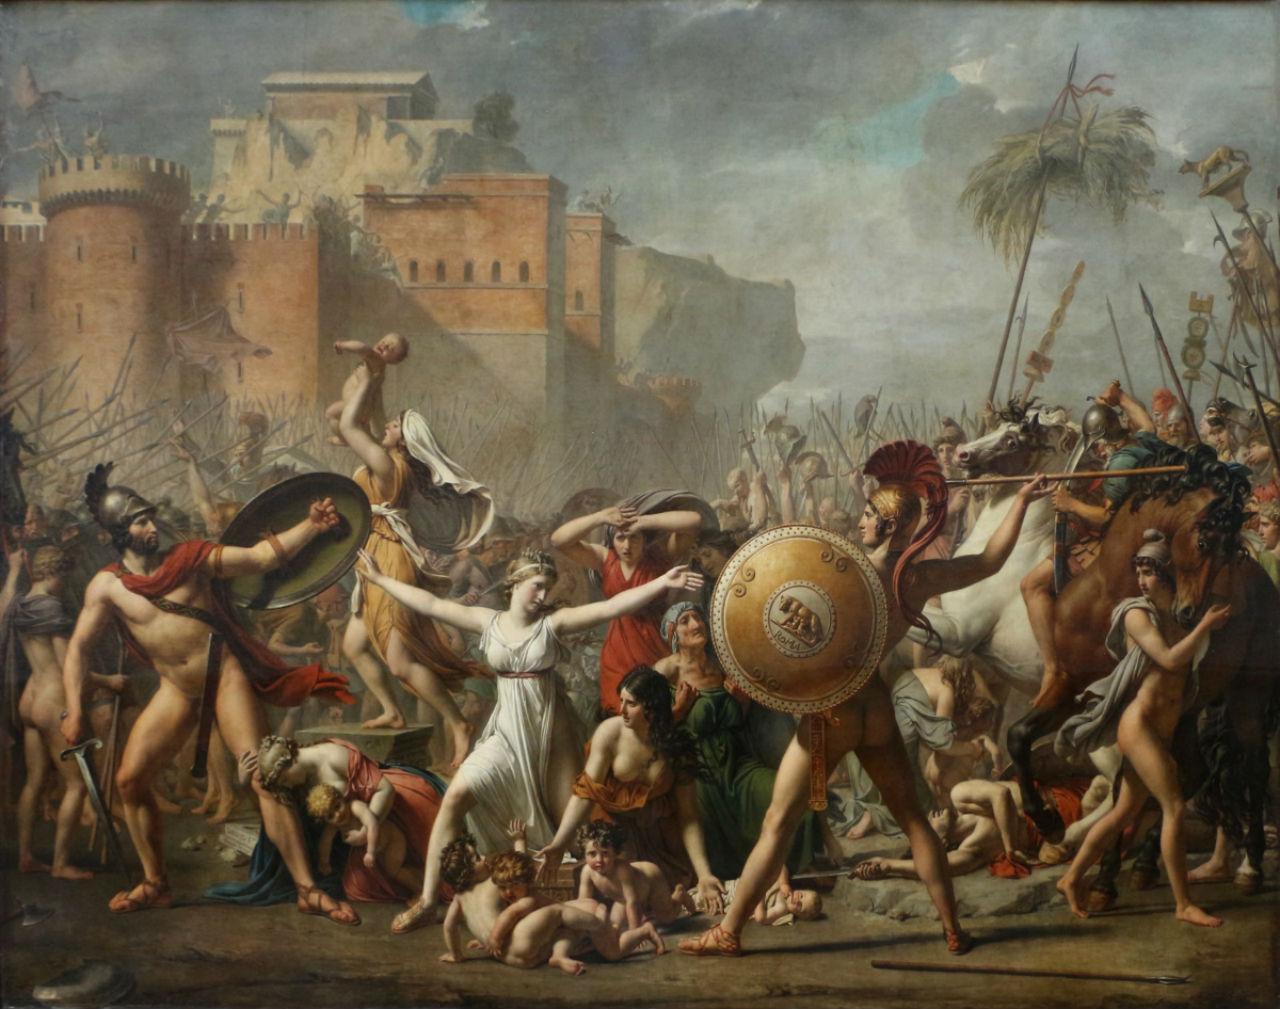 5-Жак-Луи Давид - Сабинянки останавливающие битву между римлянами и сабинянами - 1799.jpg